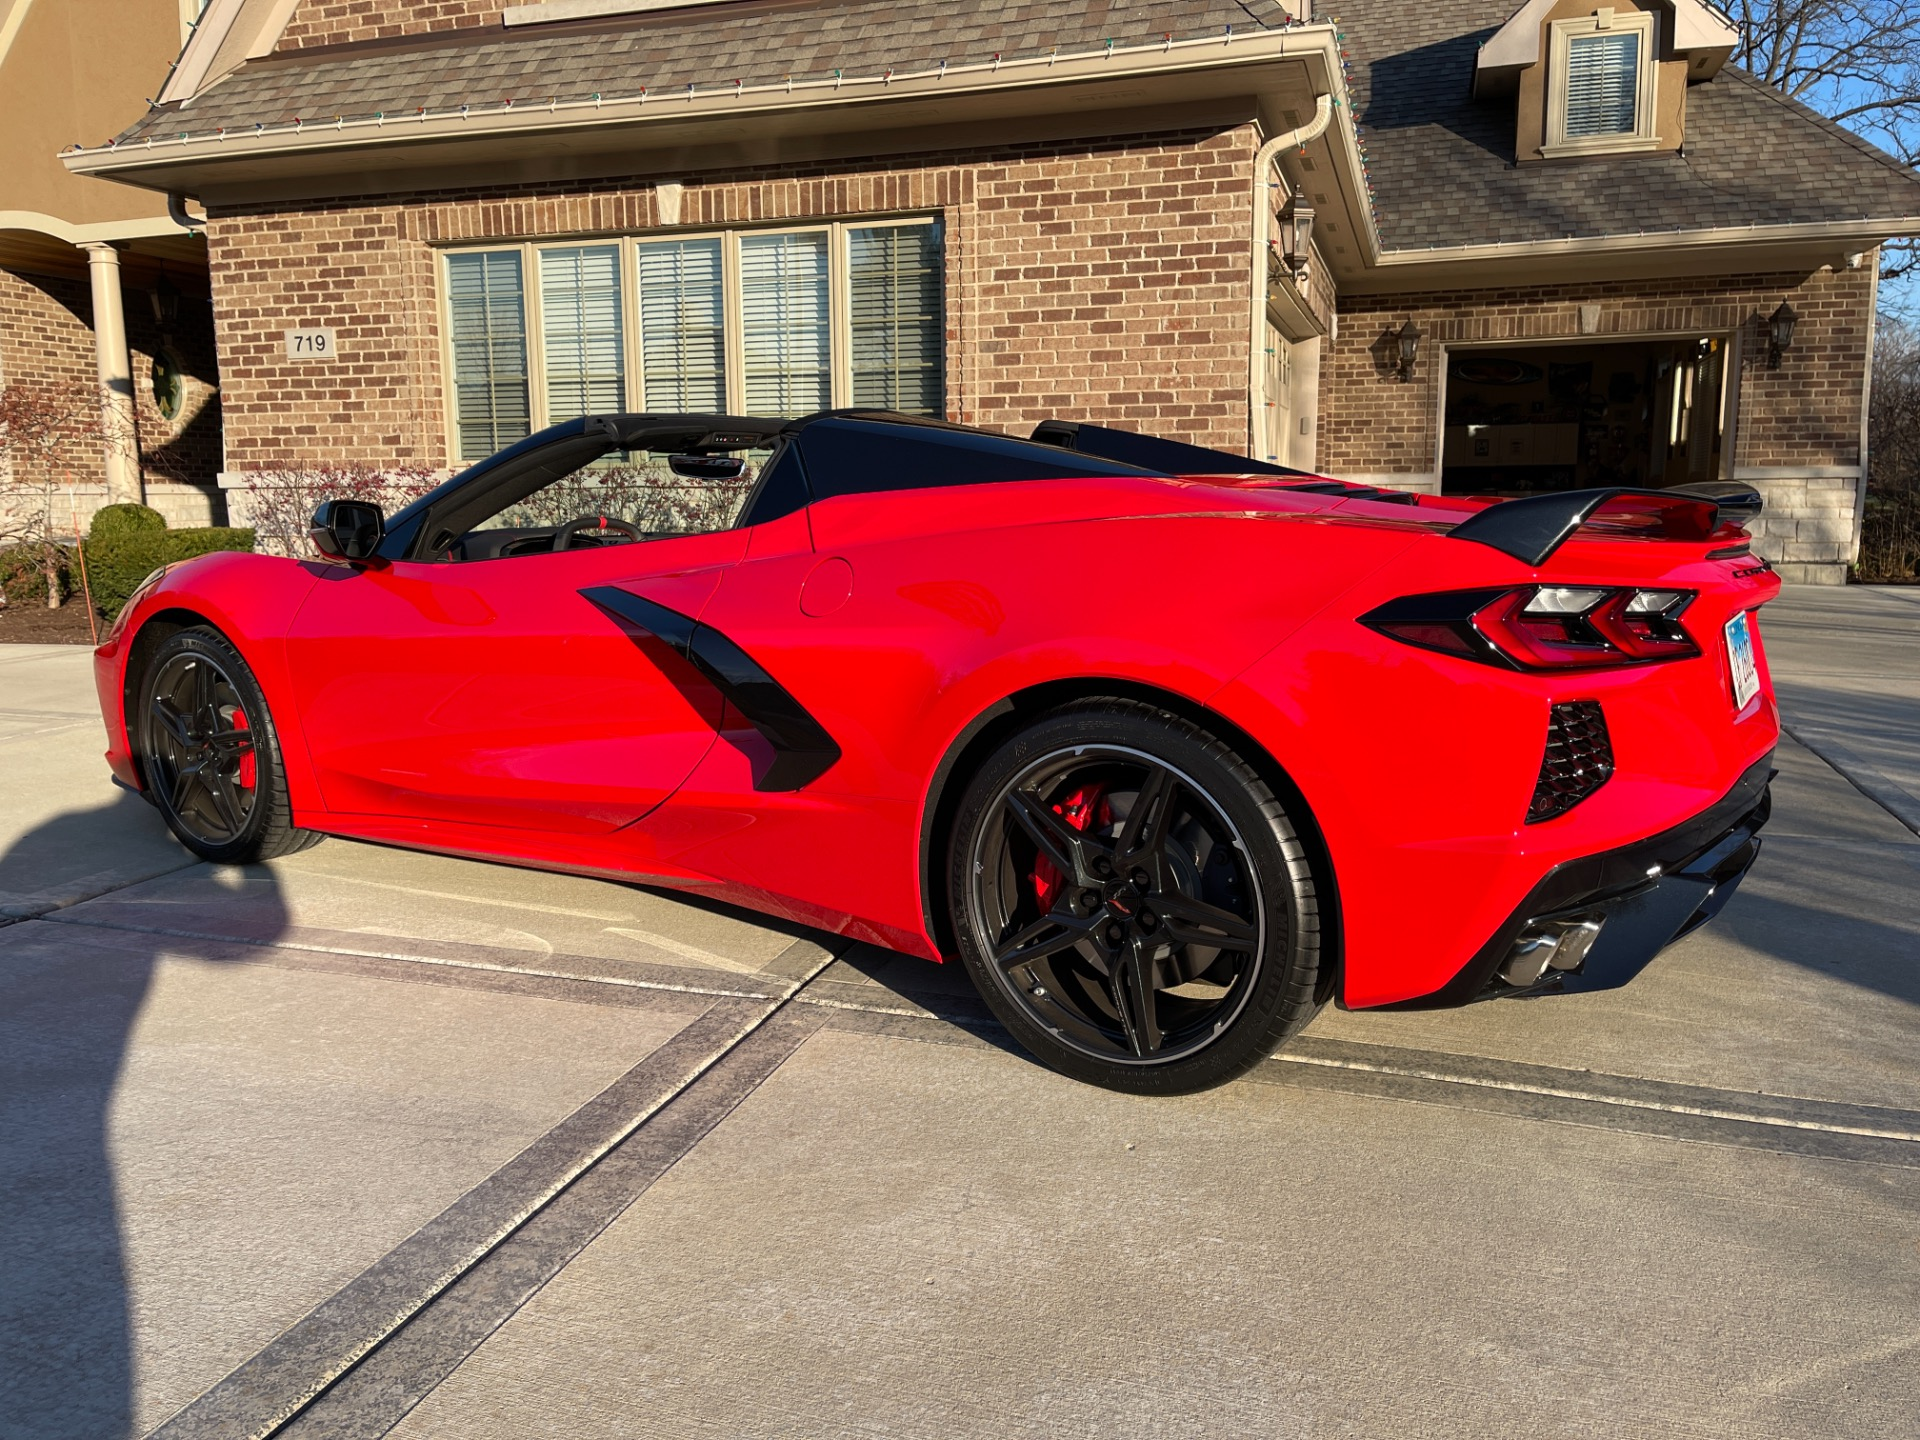 Used 2020 Chevrolet Corvette Stingray Convertible | Mundelein, IL